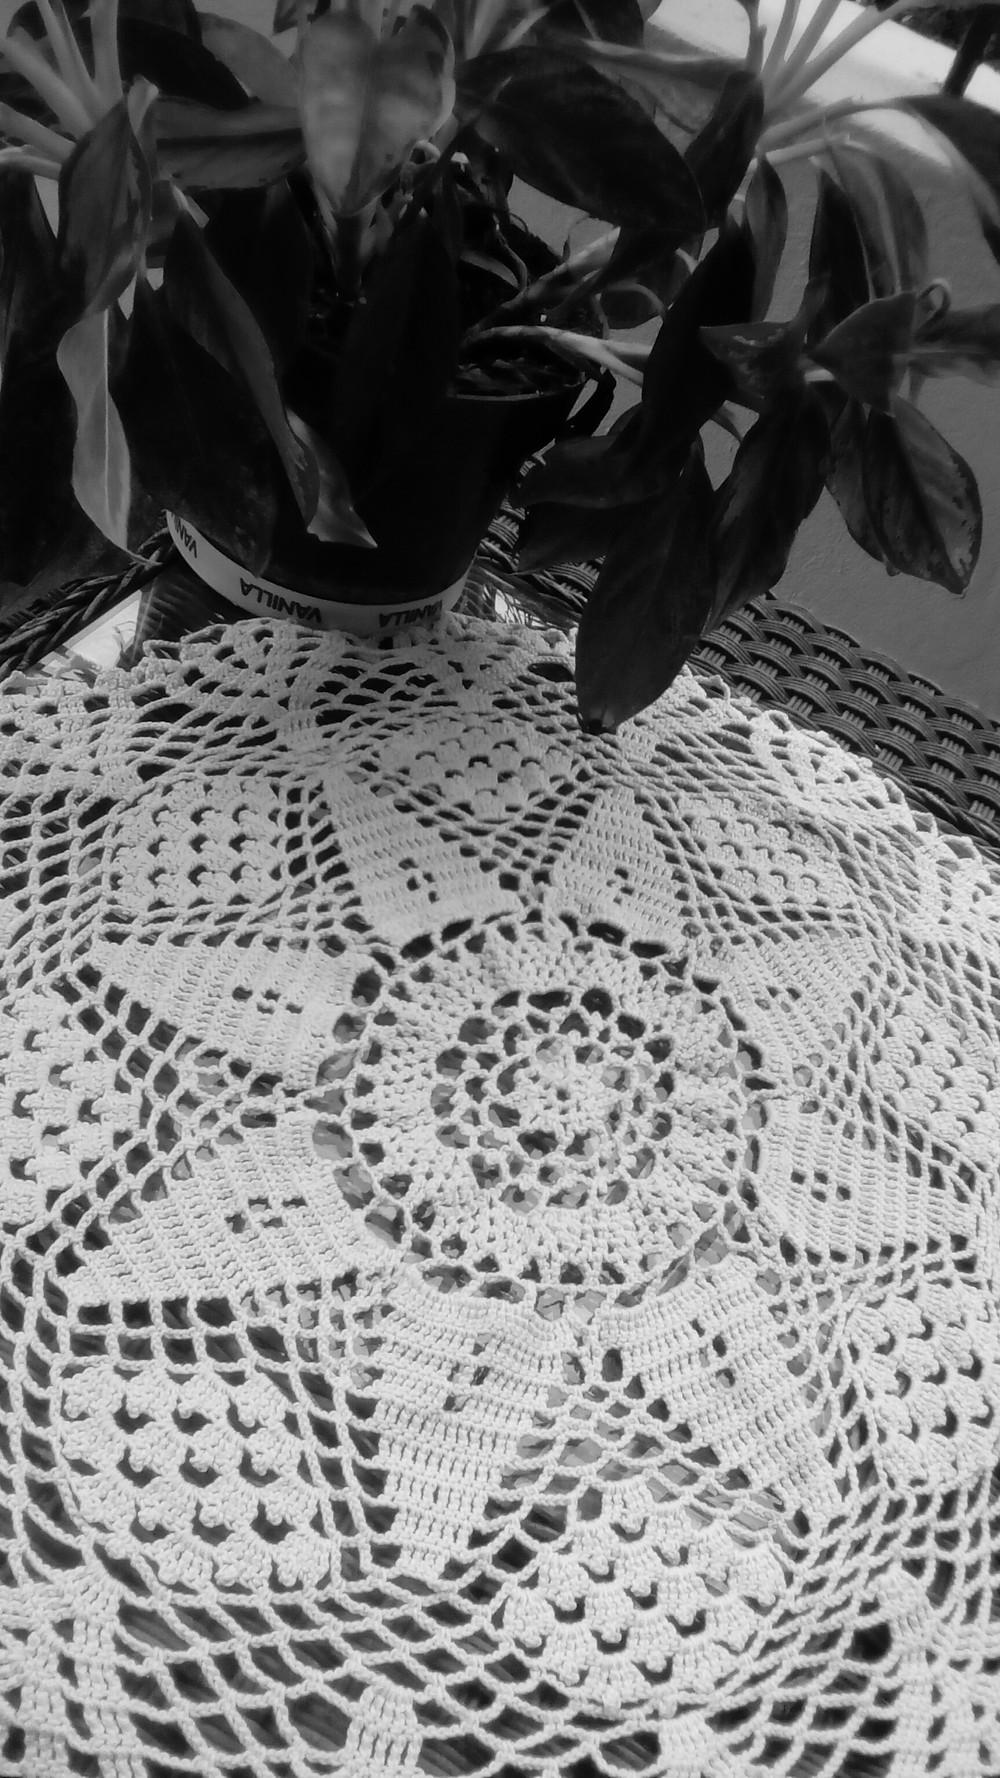 Crochet Doily - My Grandmother's Original